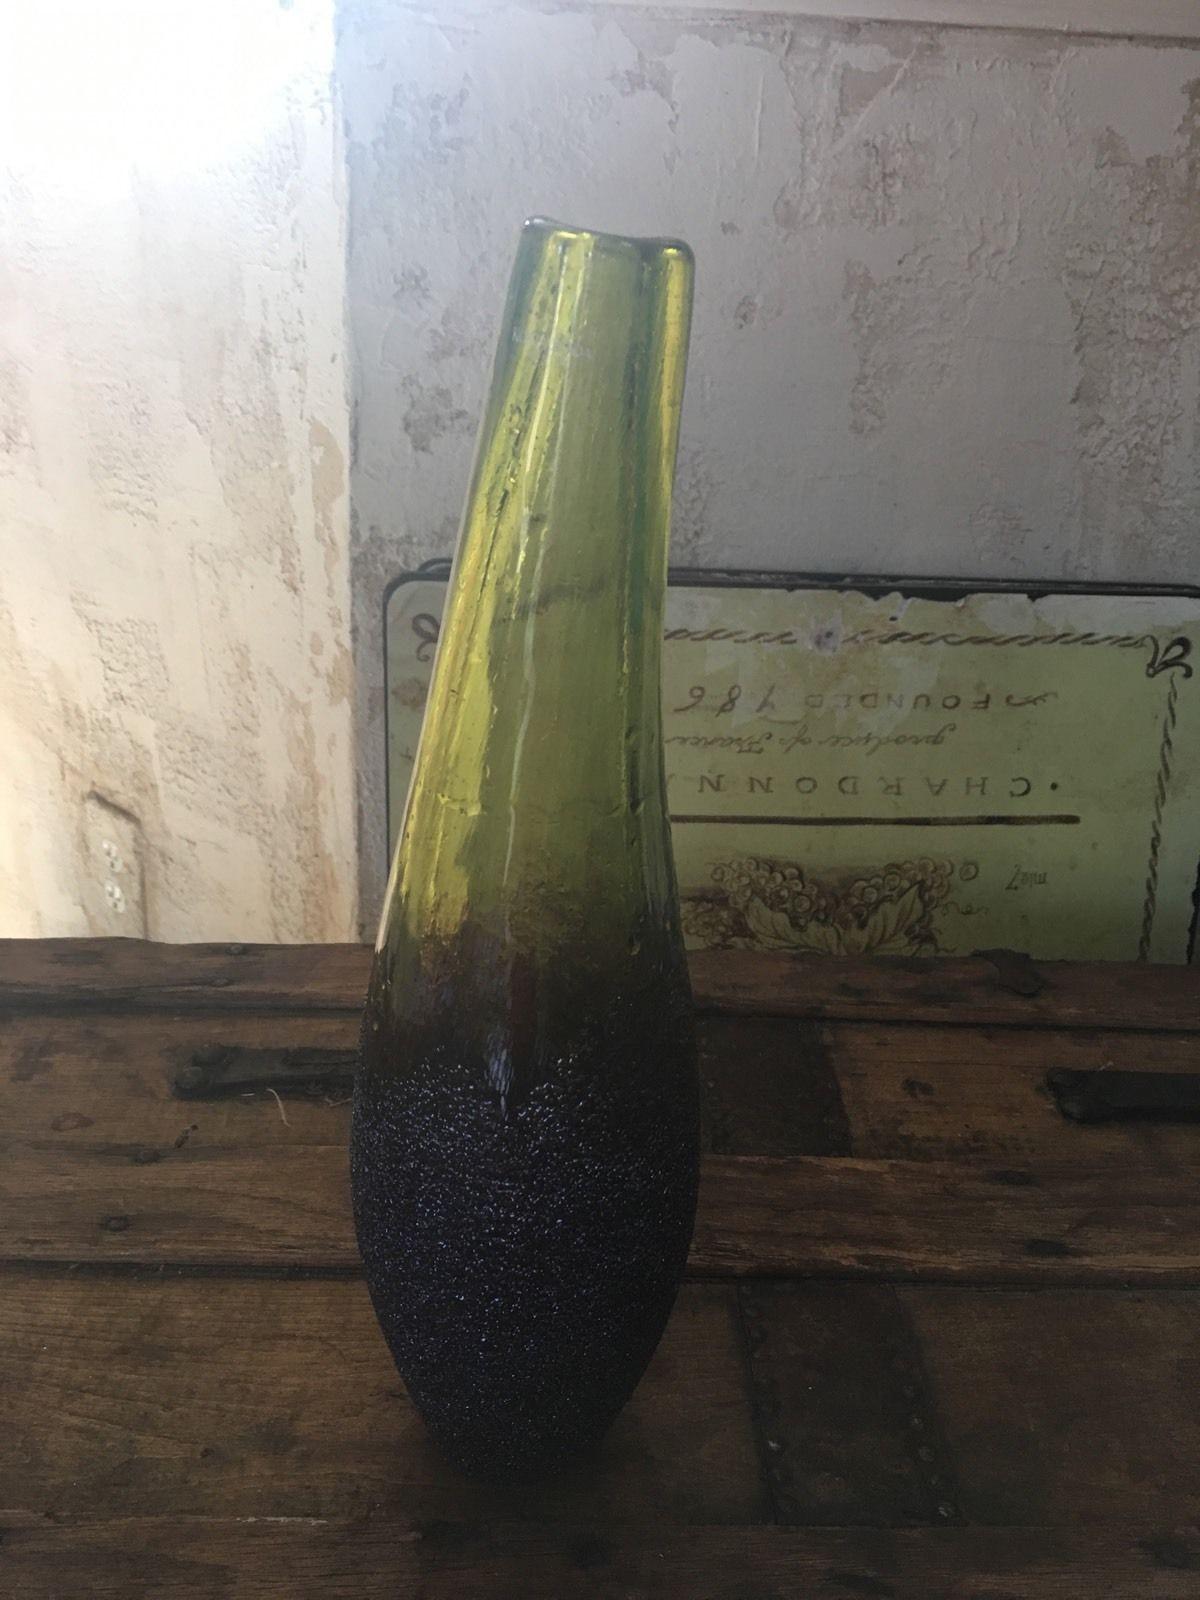 kosta boda vases australia of kosta boda moonlanding art glass vase by monica backstra¶m regarding kosta boda moonlanding art glass vase by monica backstra¶m 1 of 5 kosta boda